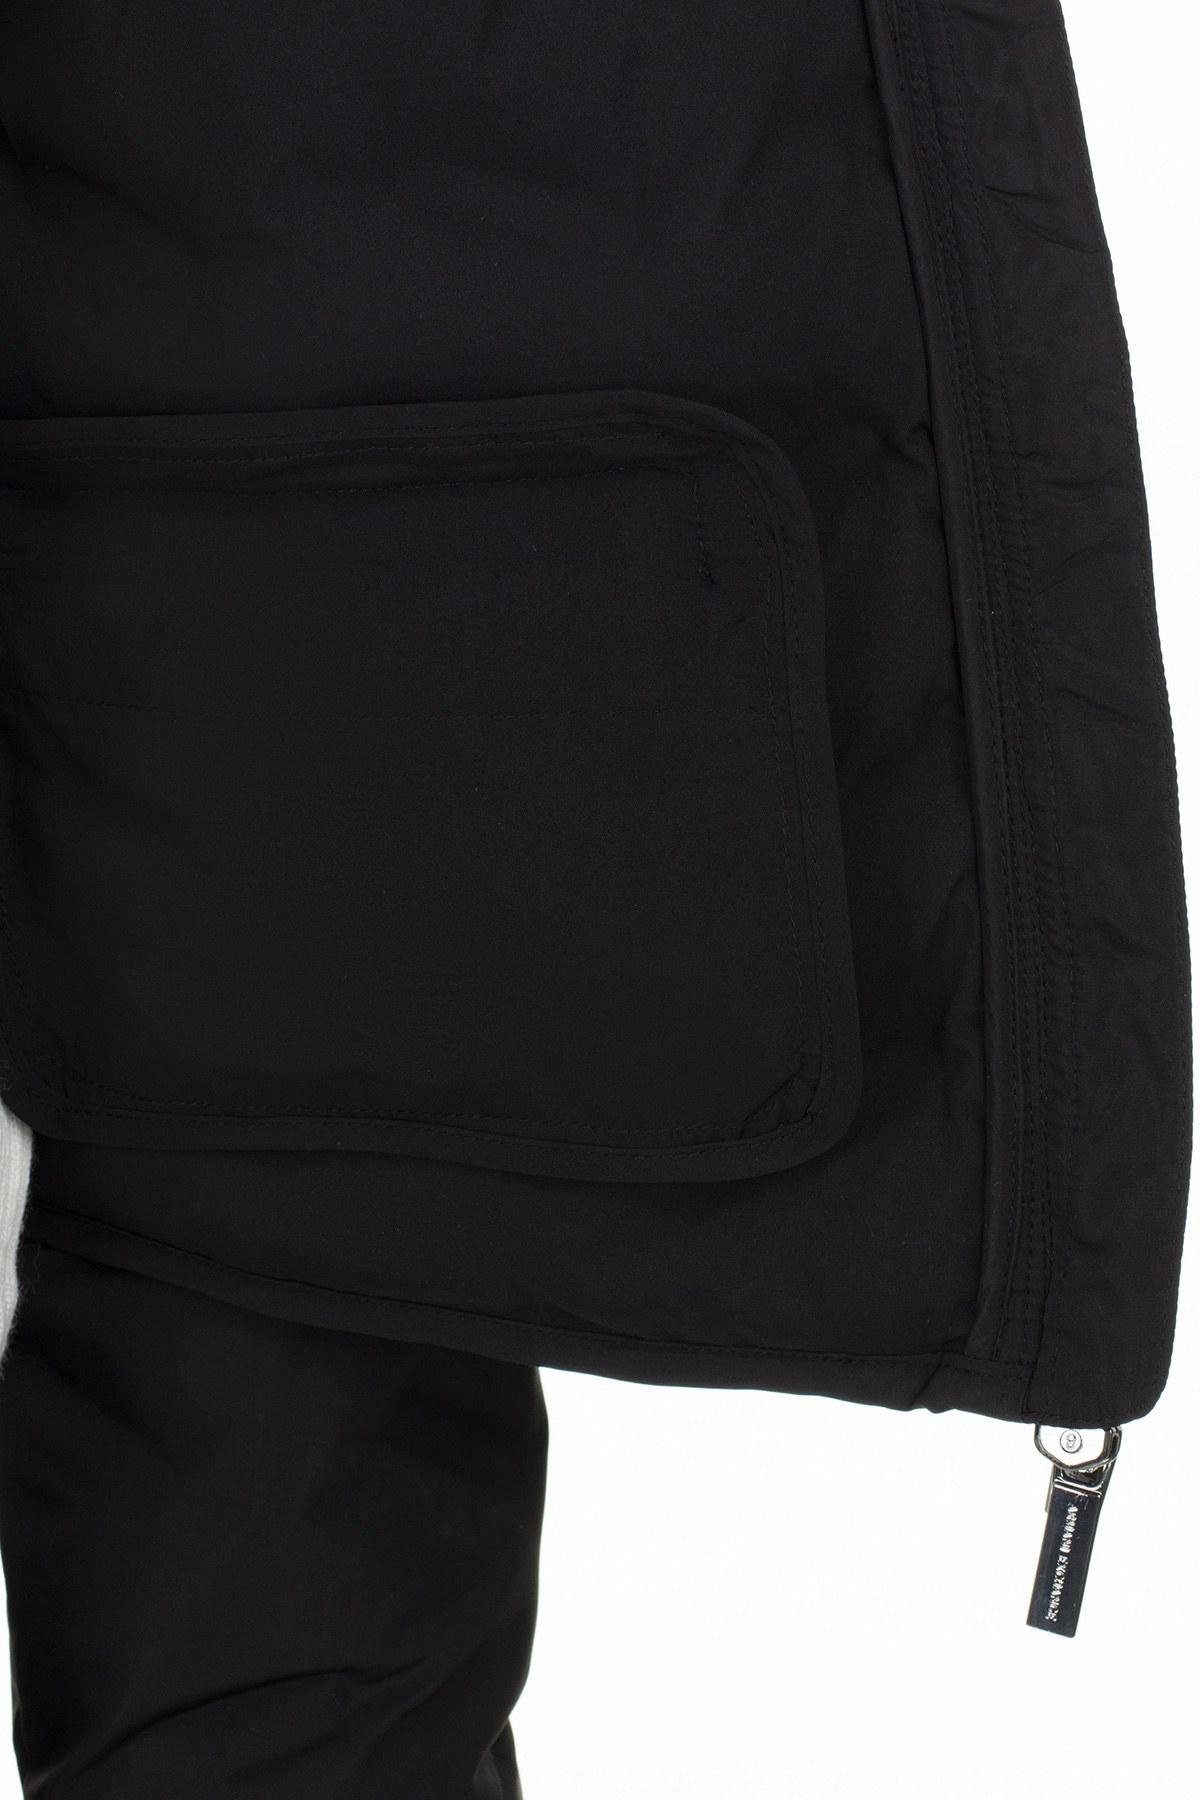 Armani Exchange Logo Baskılı Dik Yaka Şişme Bayan Mont 6GYB05 YNNCZ 1200 SİYAH